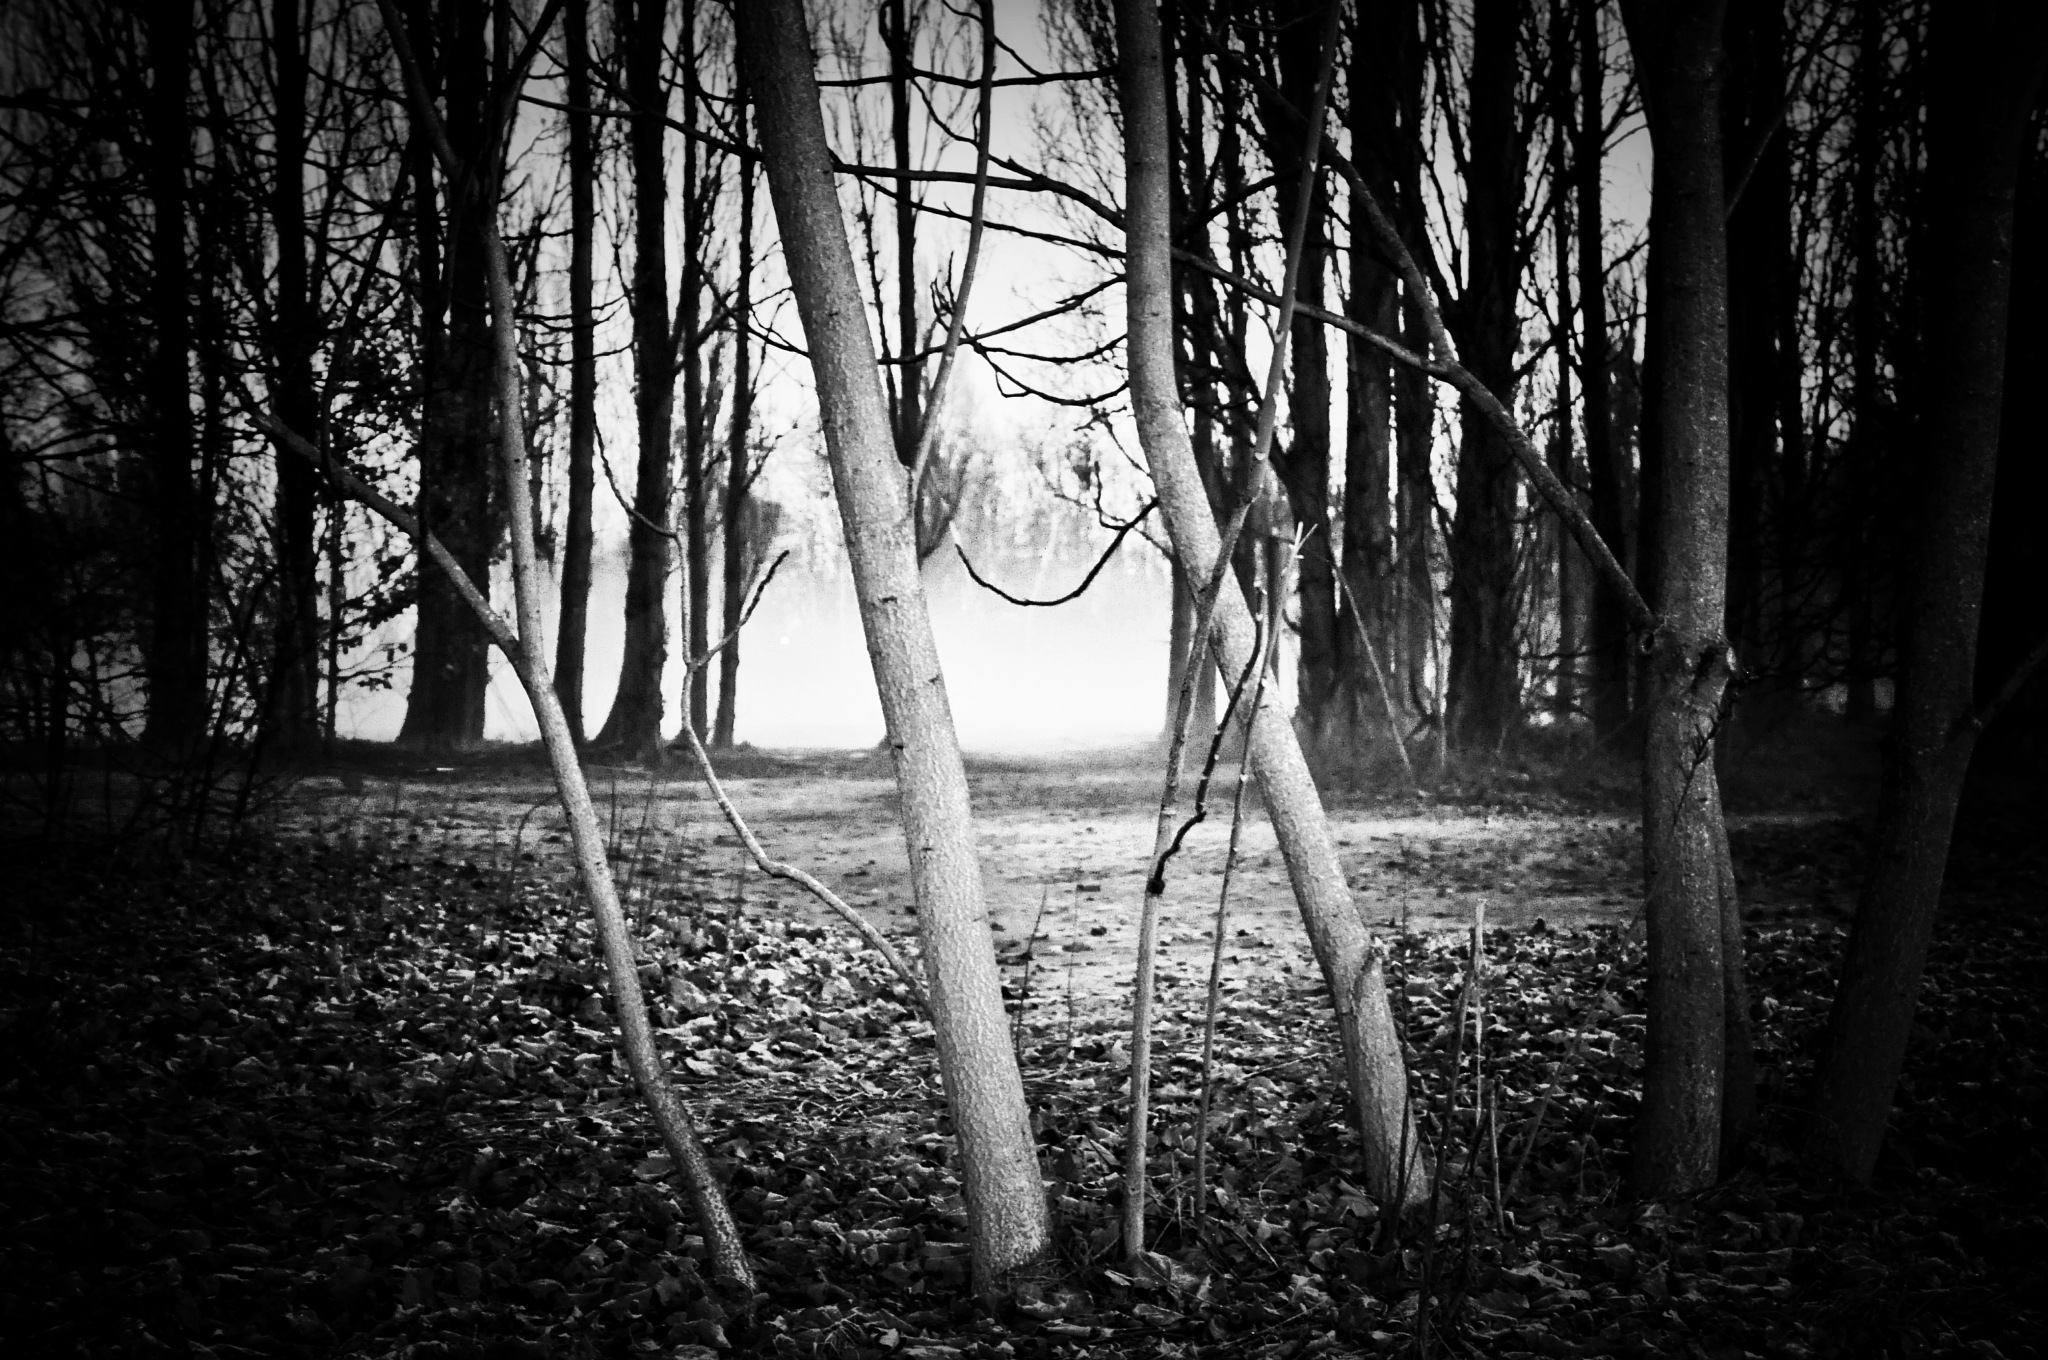 Untitled by Caroline Barberis